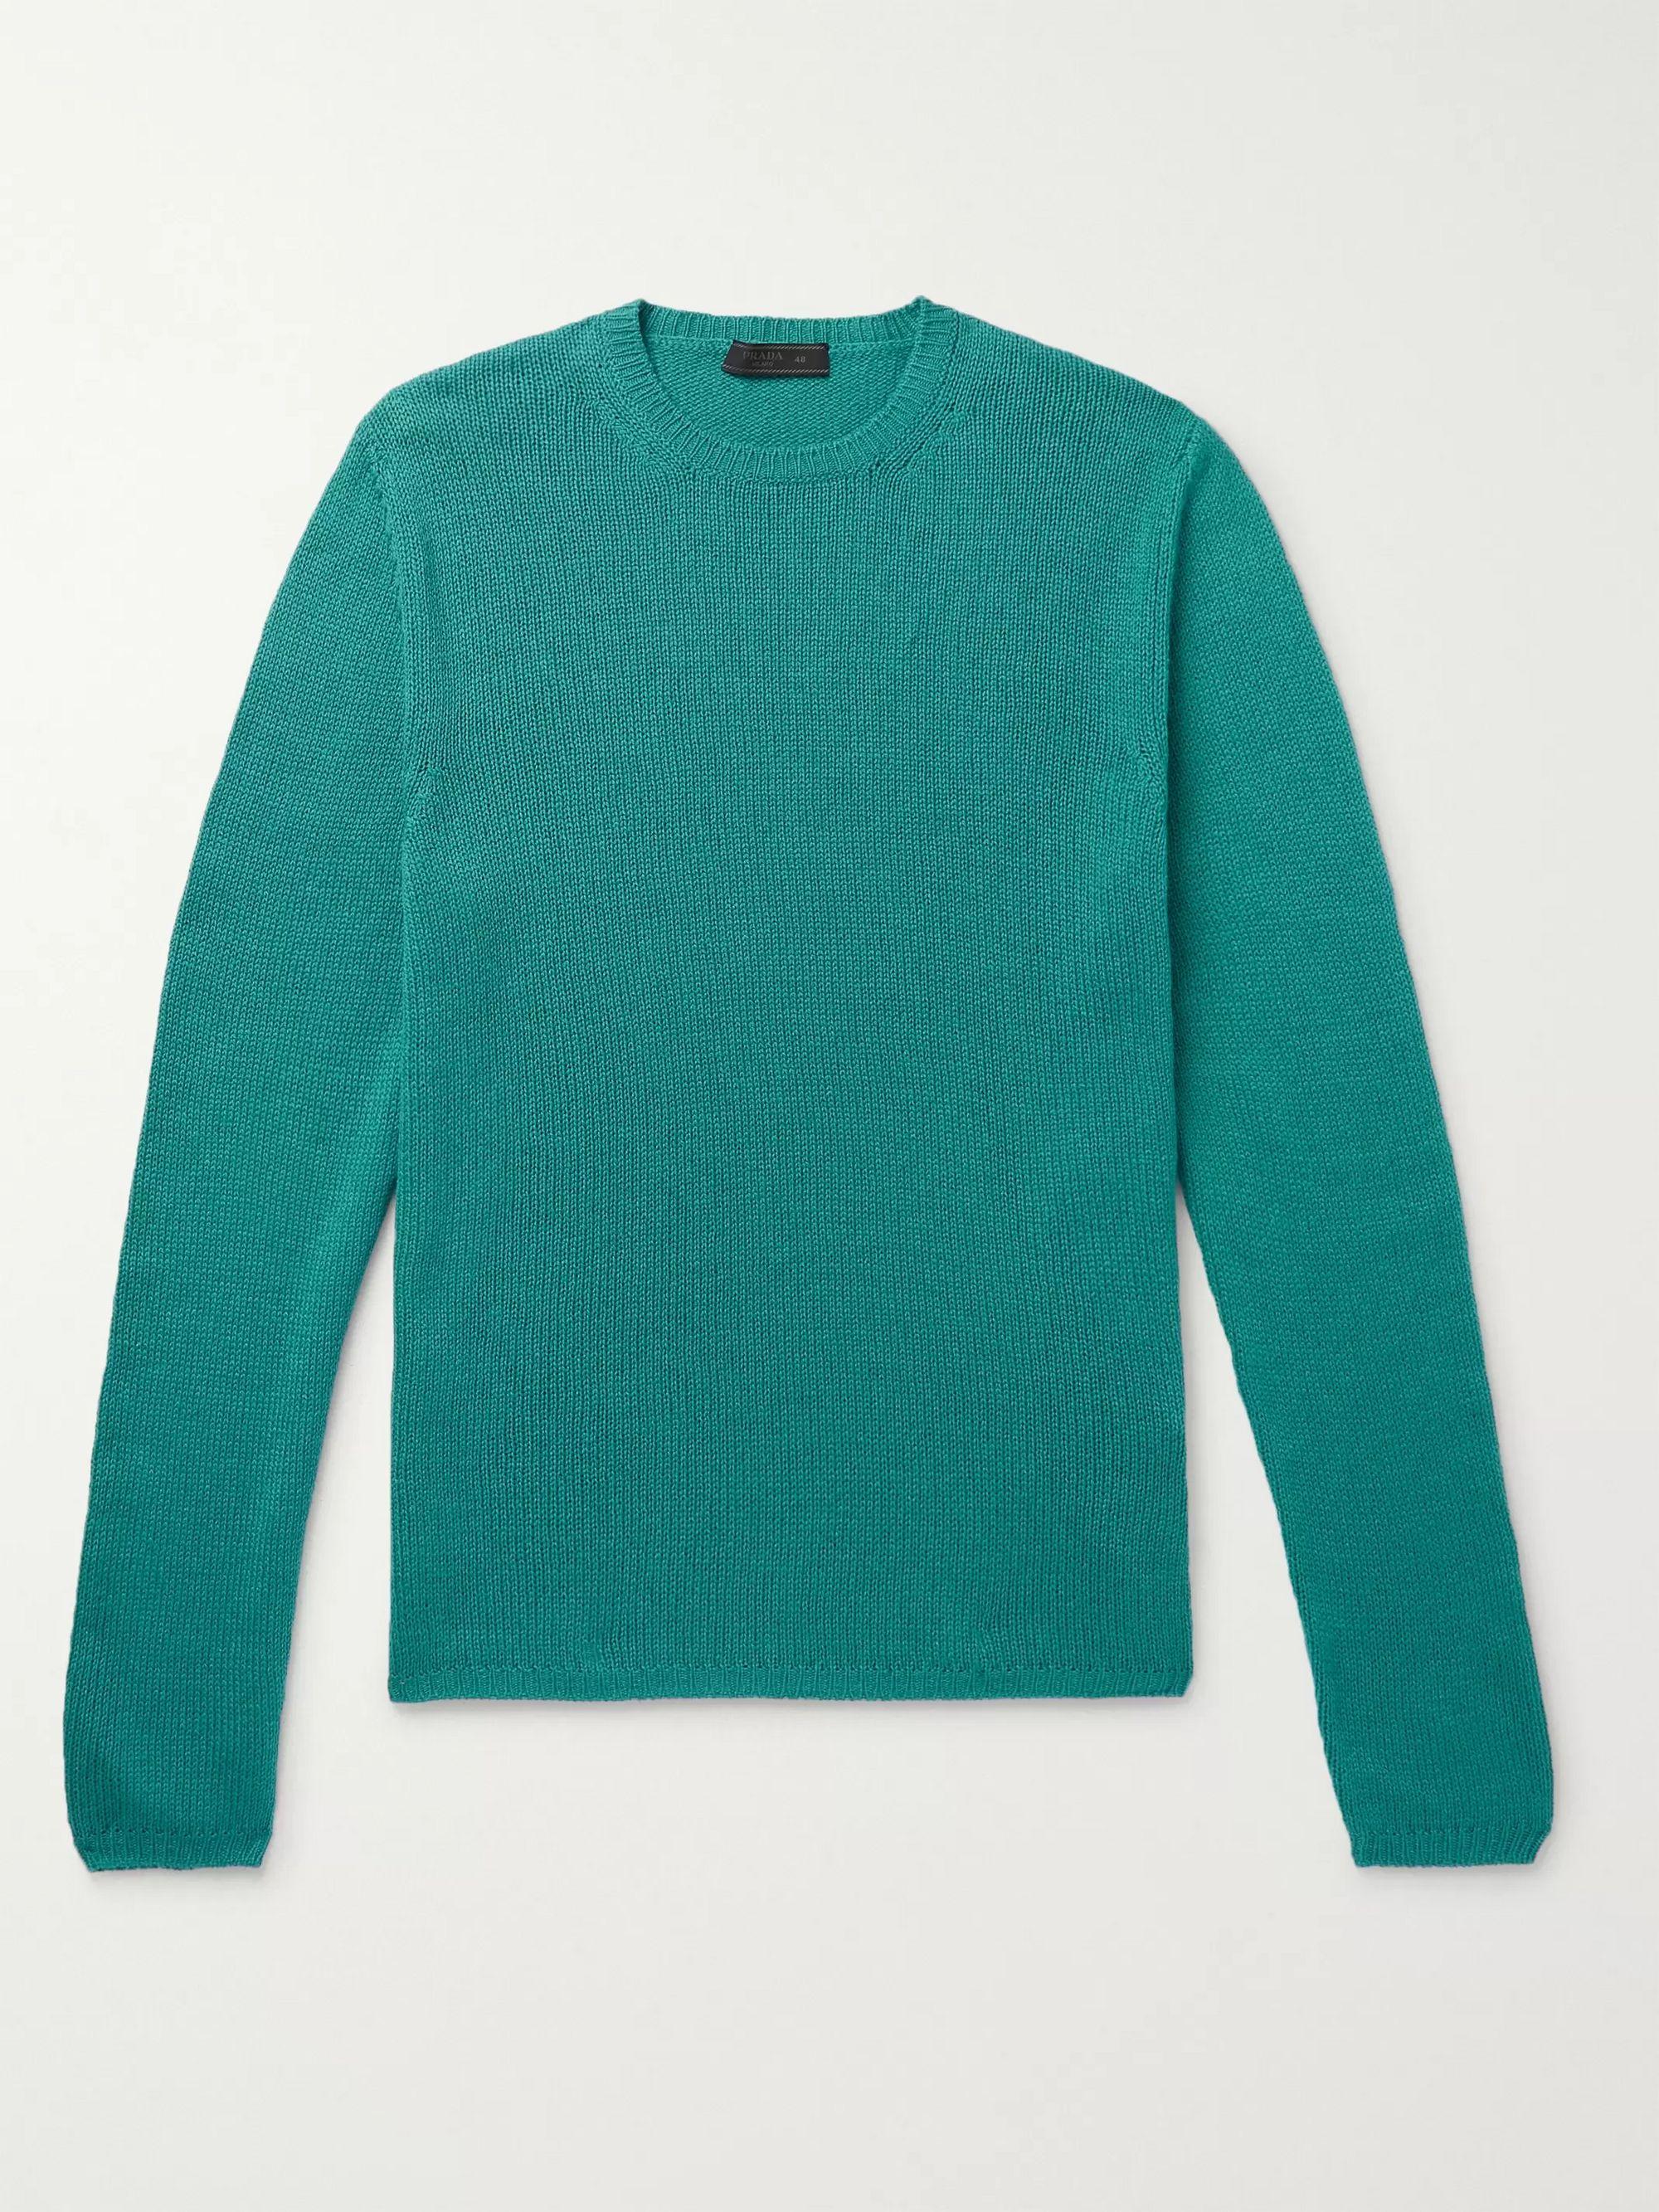 Slim Fit Cashmere Sweater